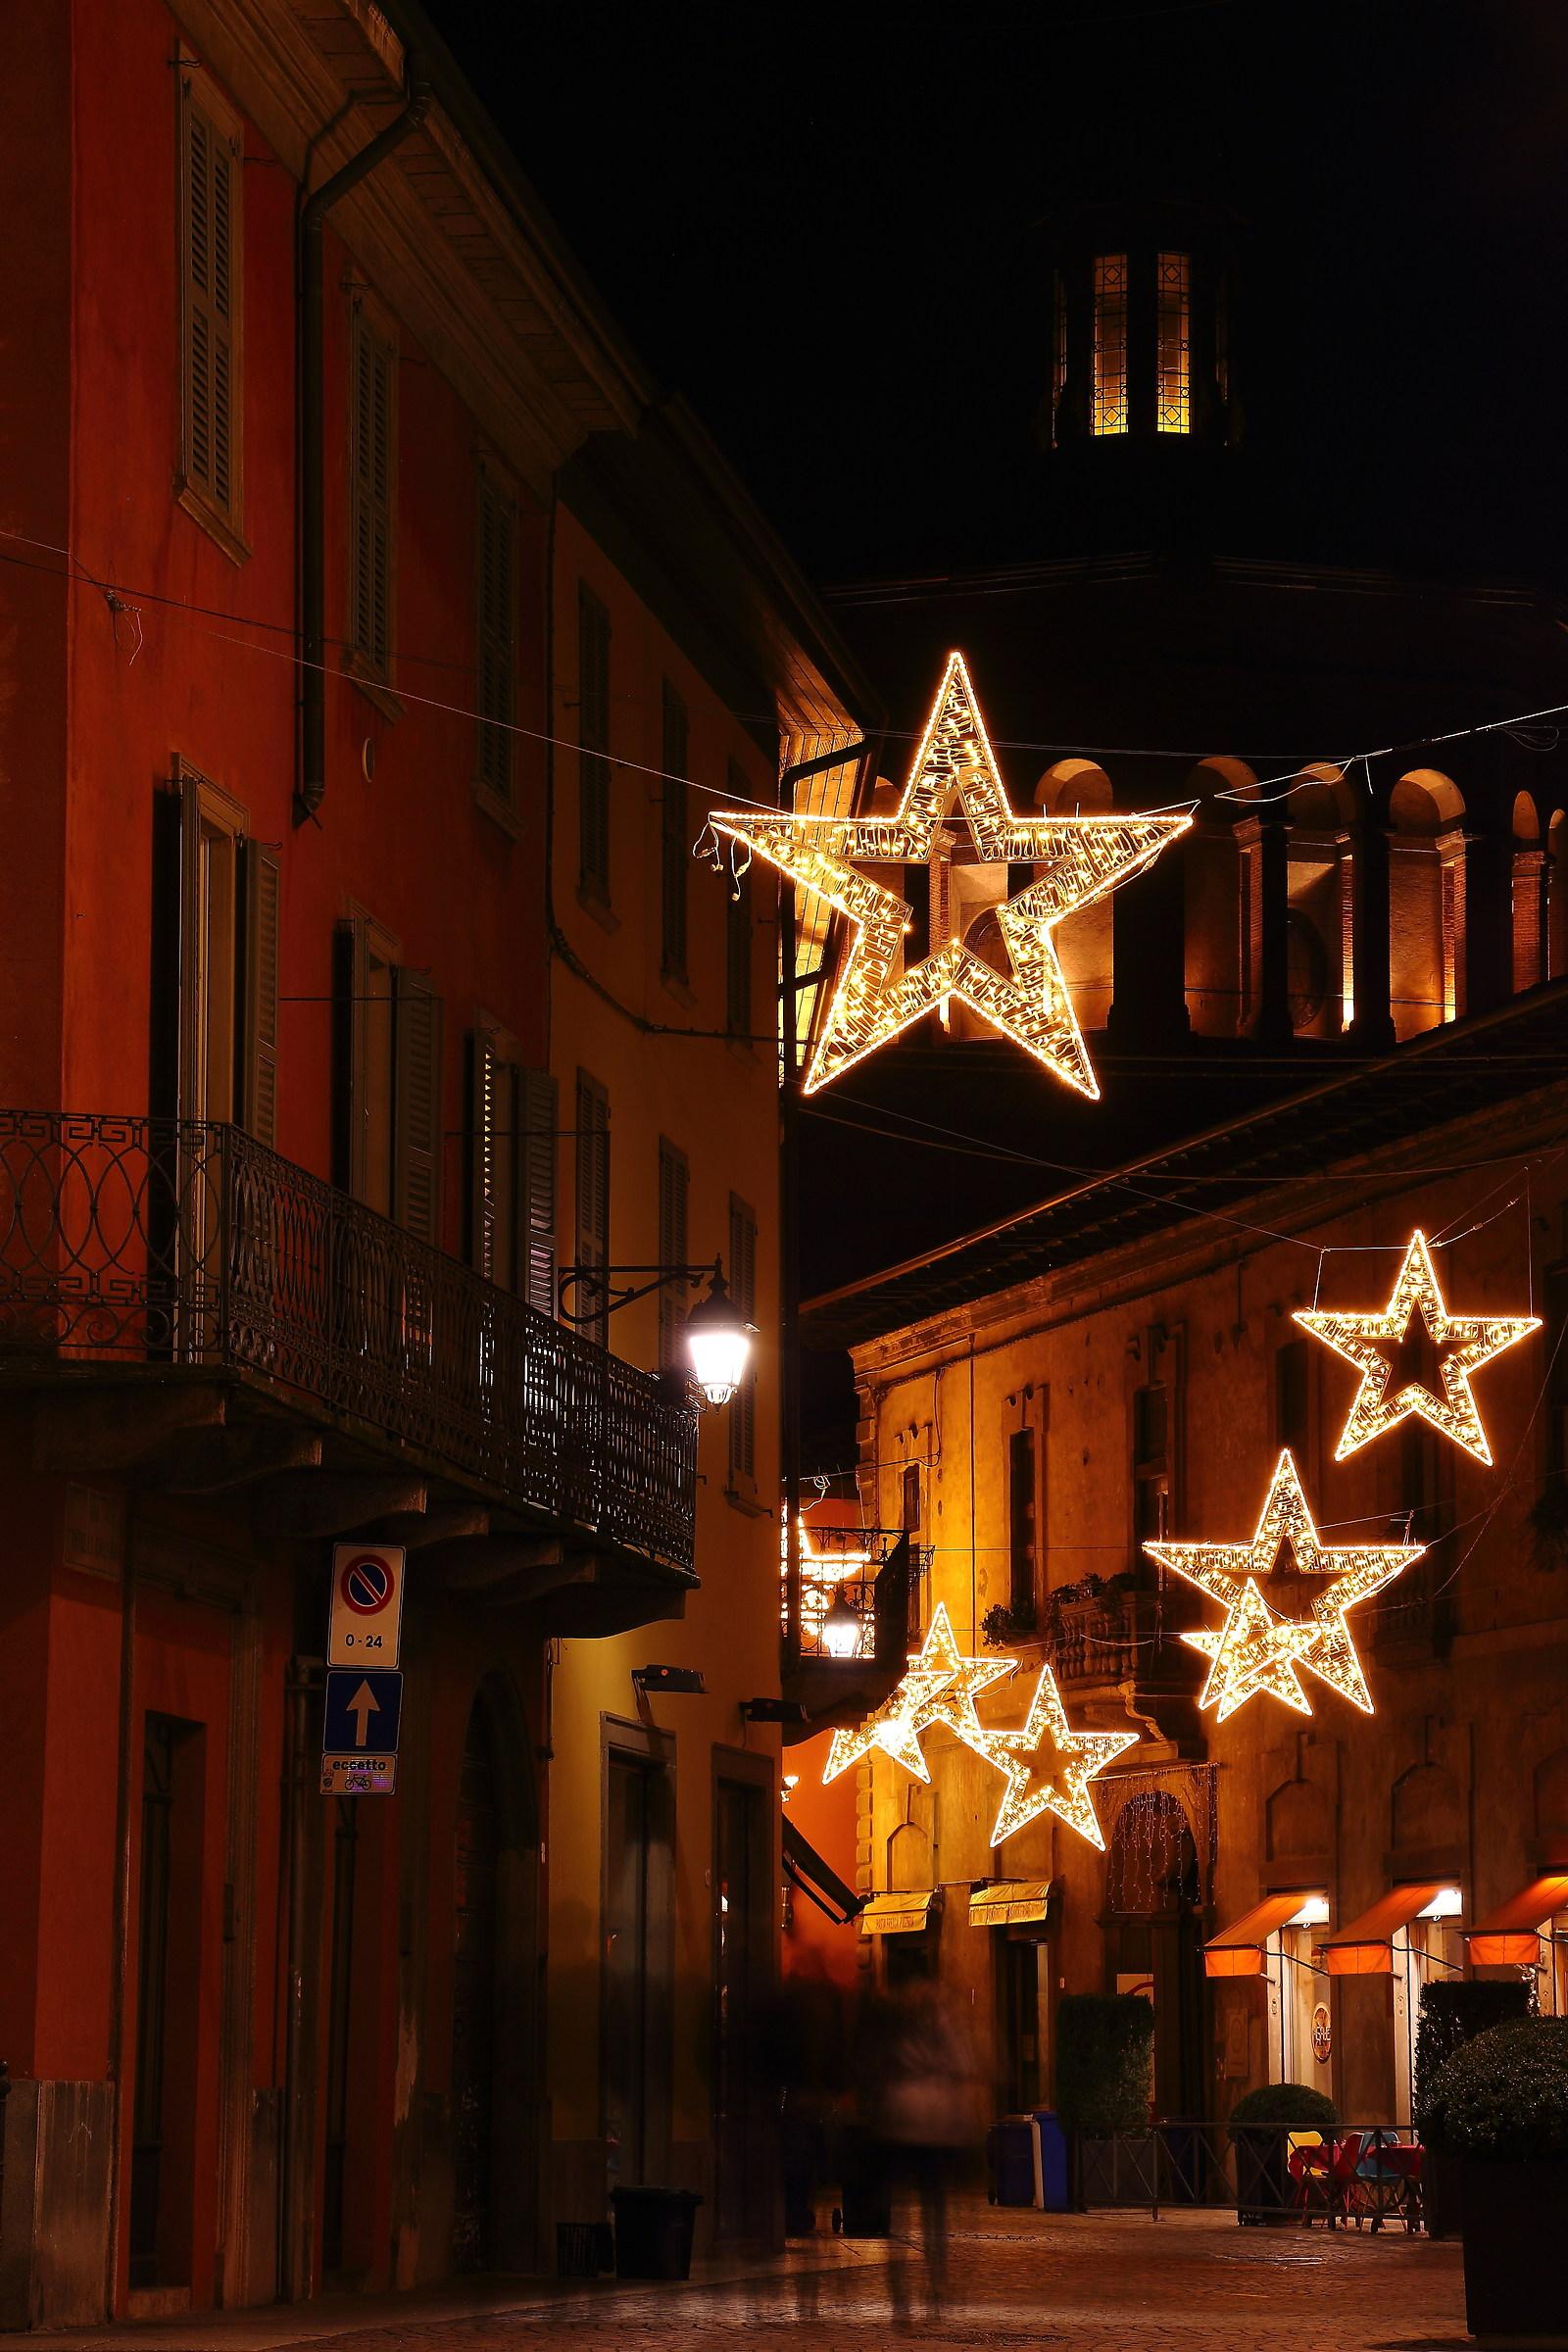 souls and the lights of christmas...